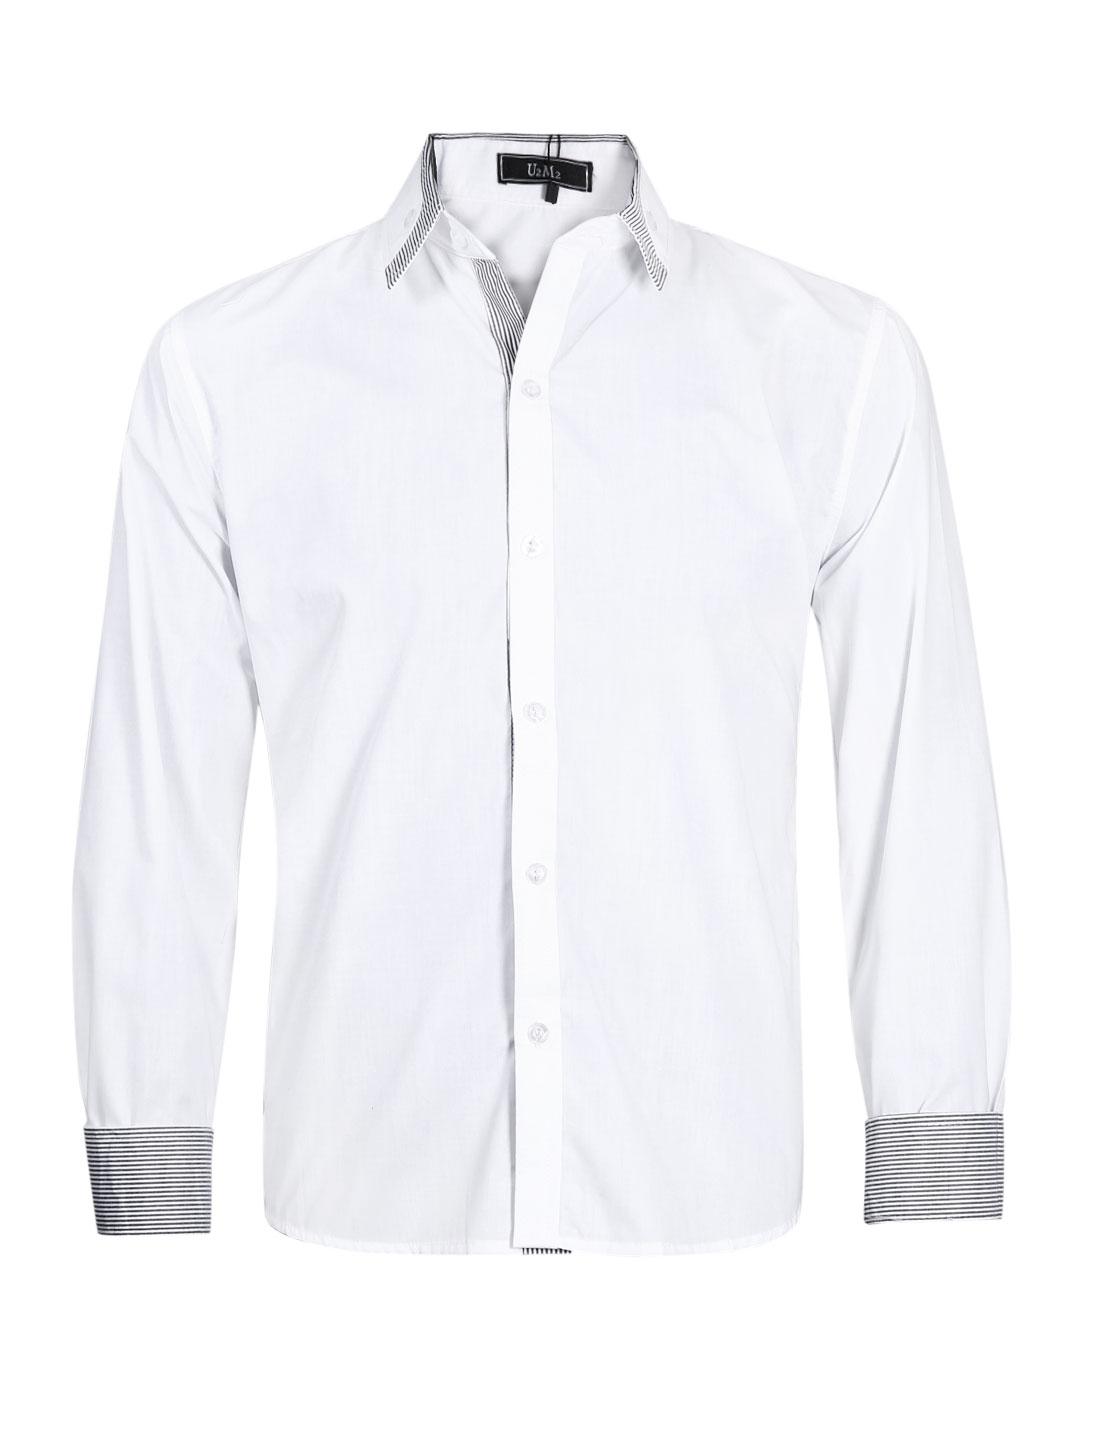 Men Long Sleeve Button Front Button Docor Stripes Detail Shirt White M